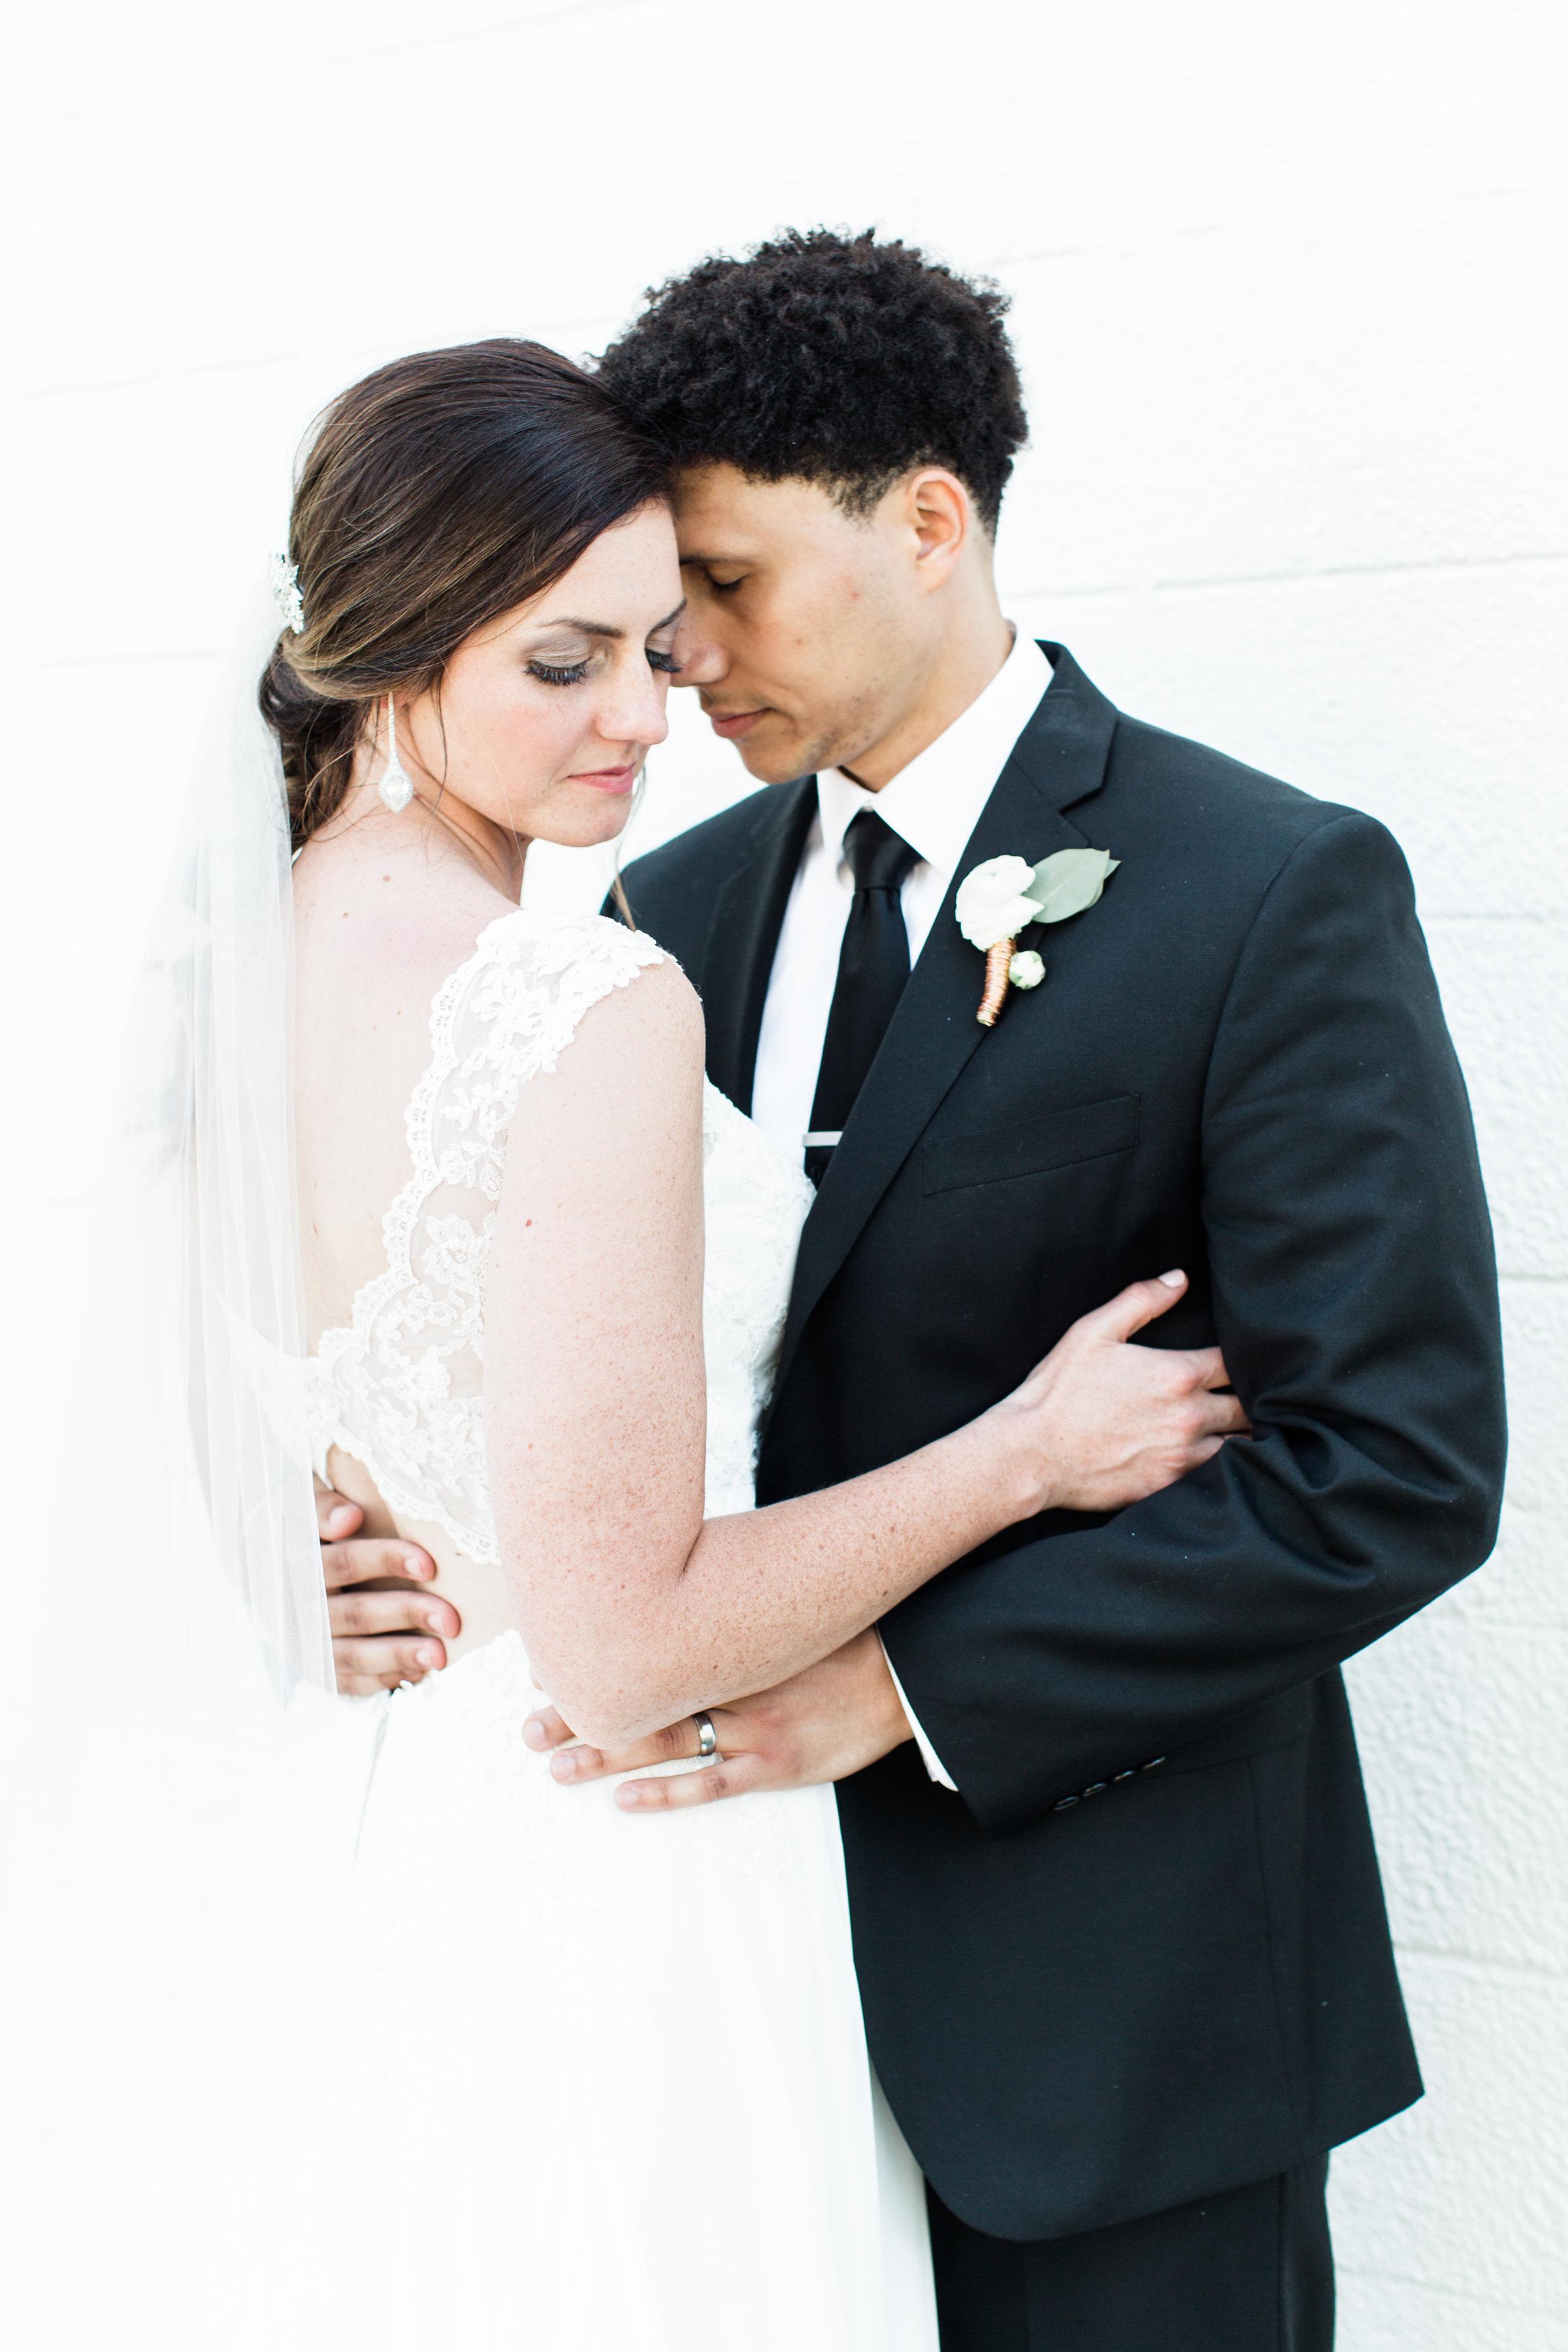 Julius+Wedding+BrideGroomb-24.jpg